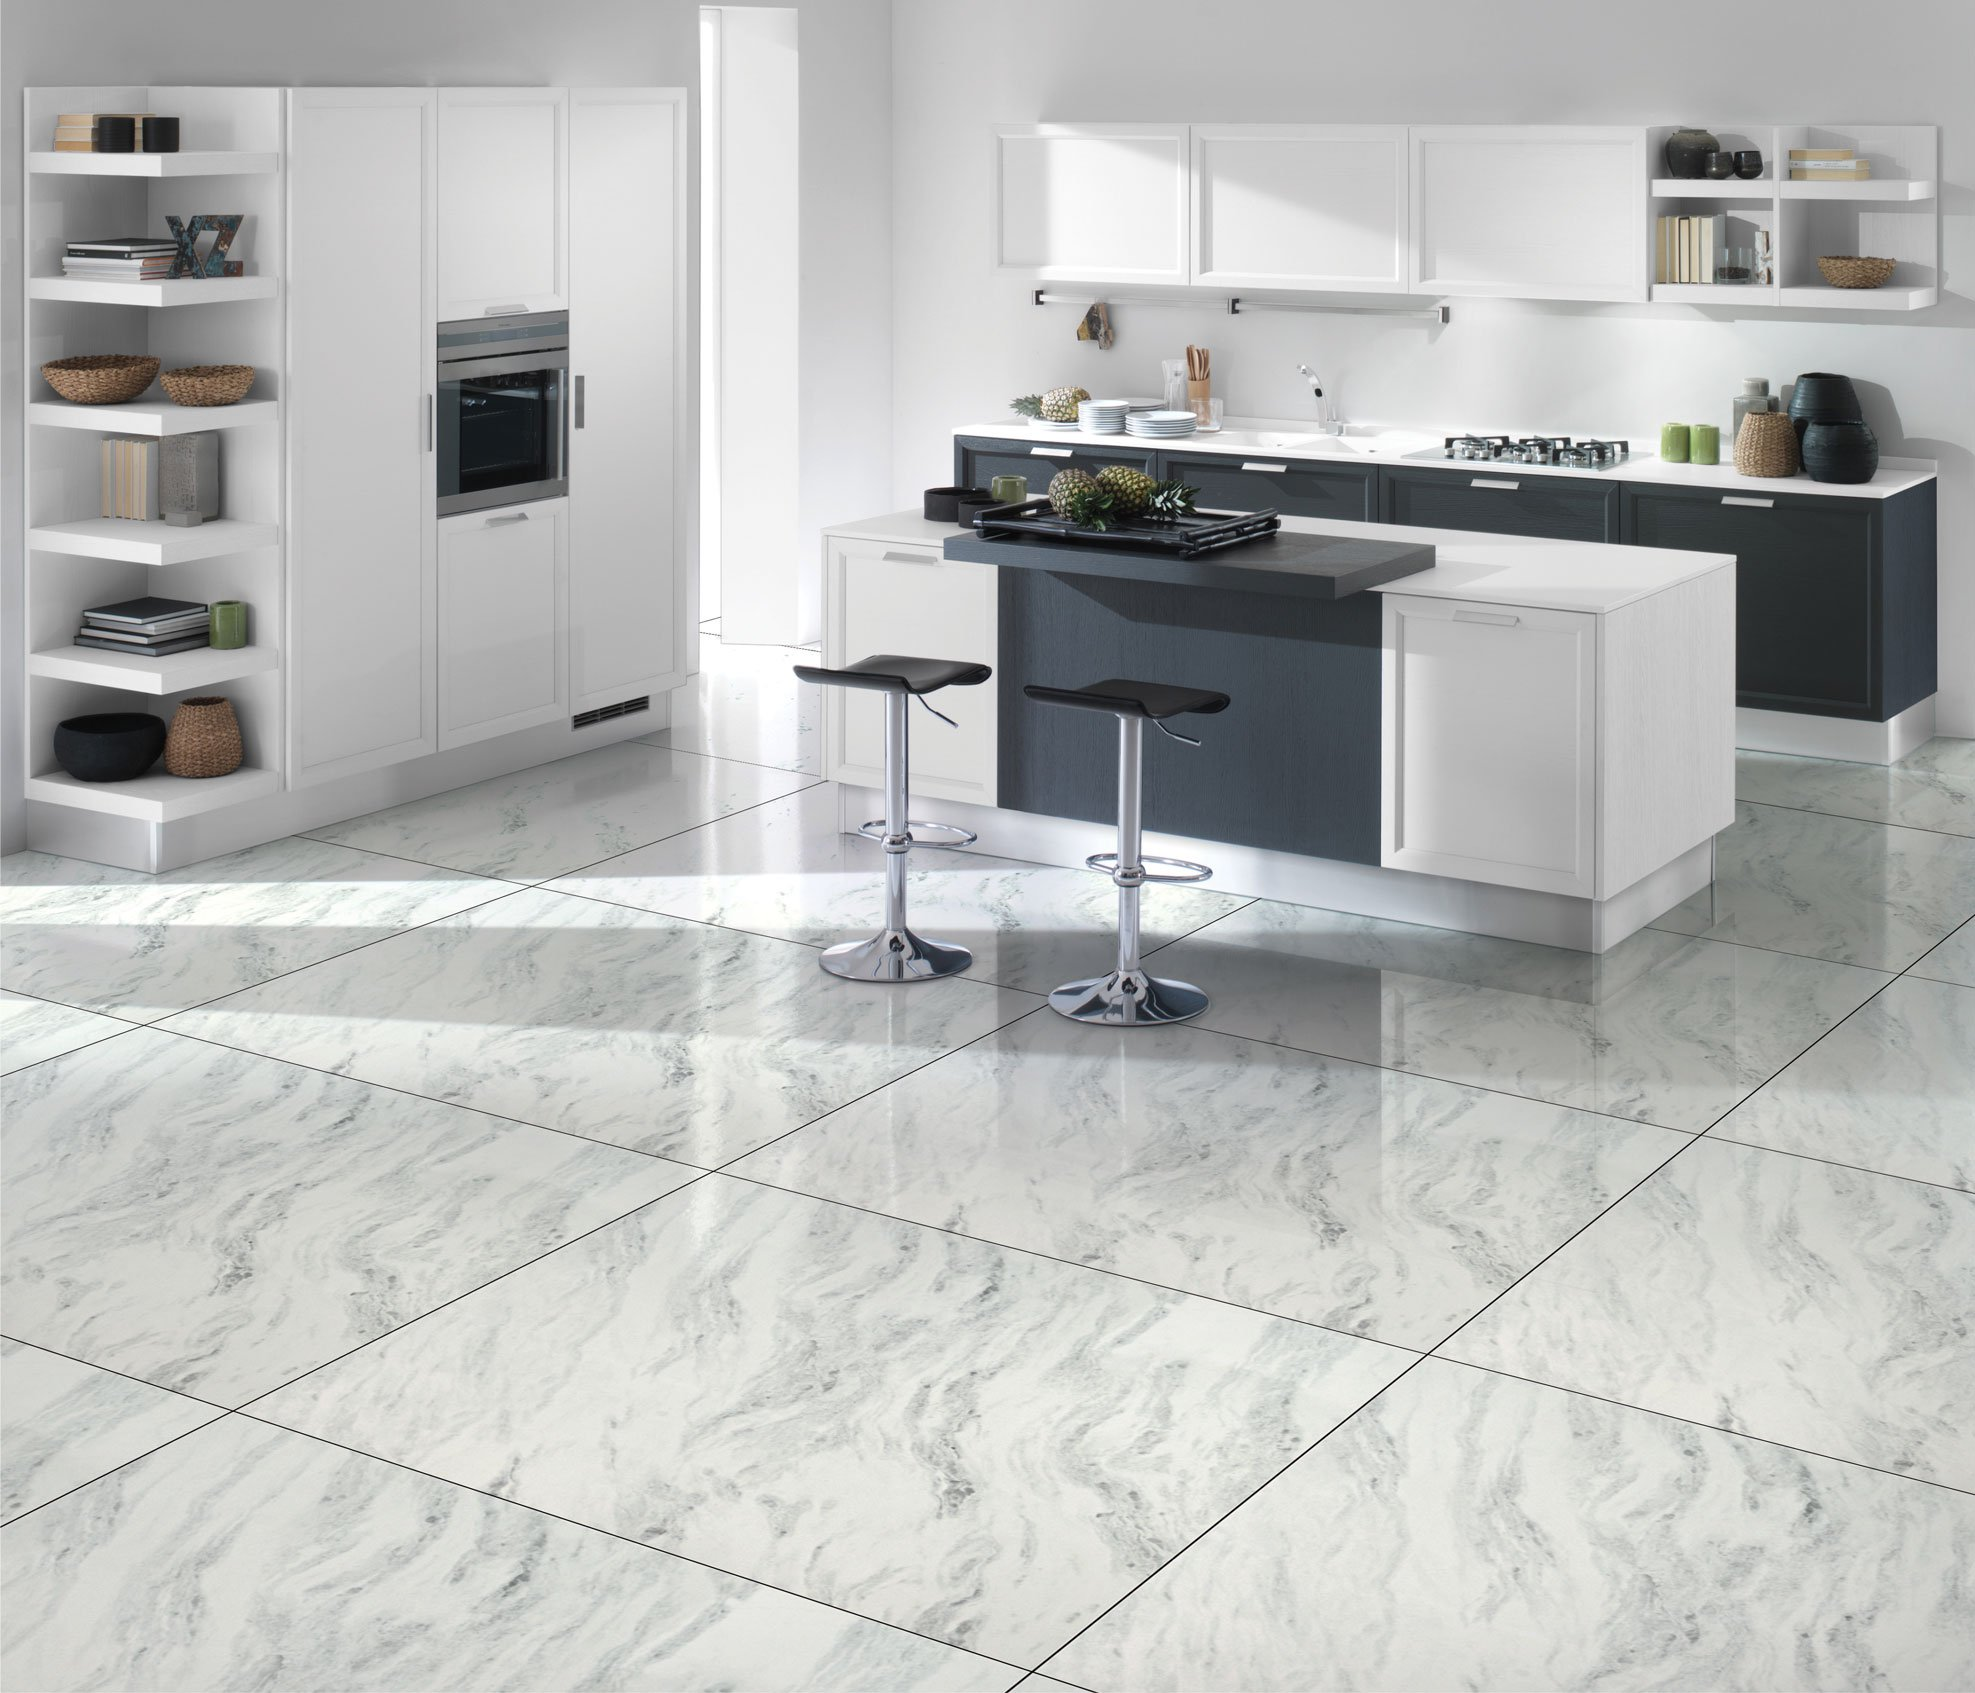 best type of tile for kitchen floor